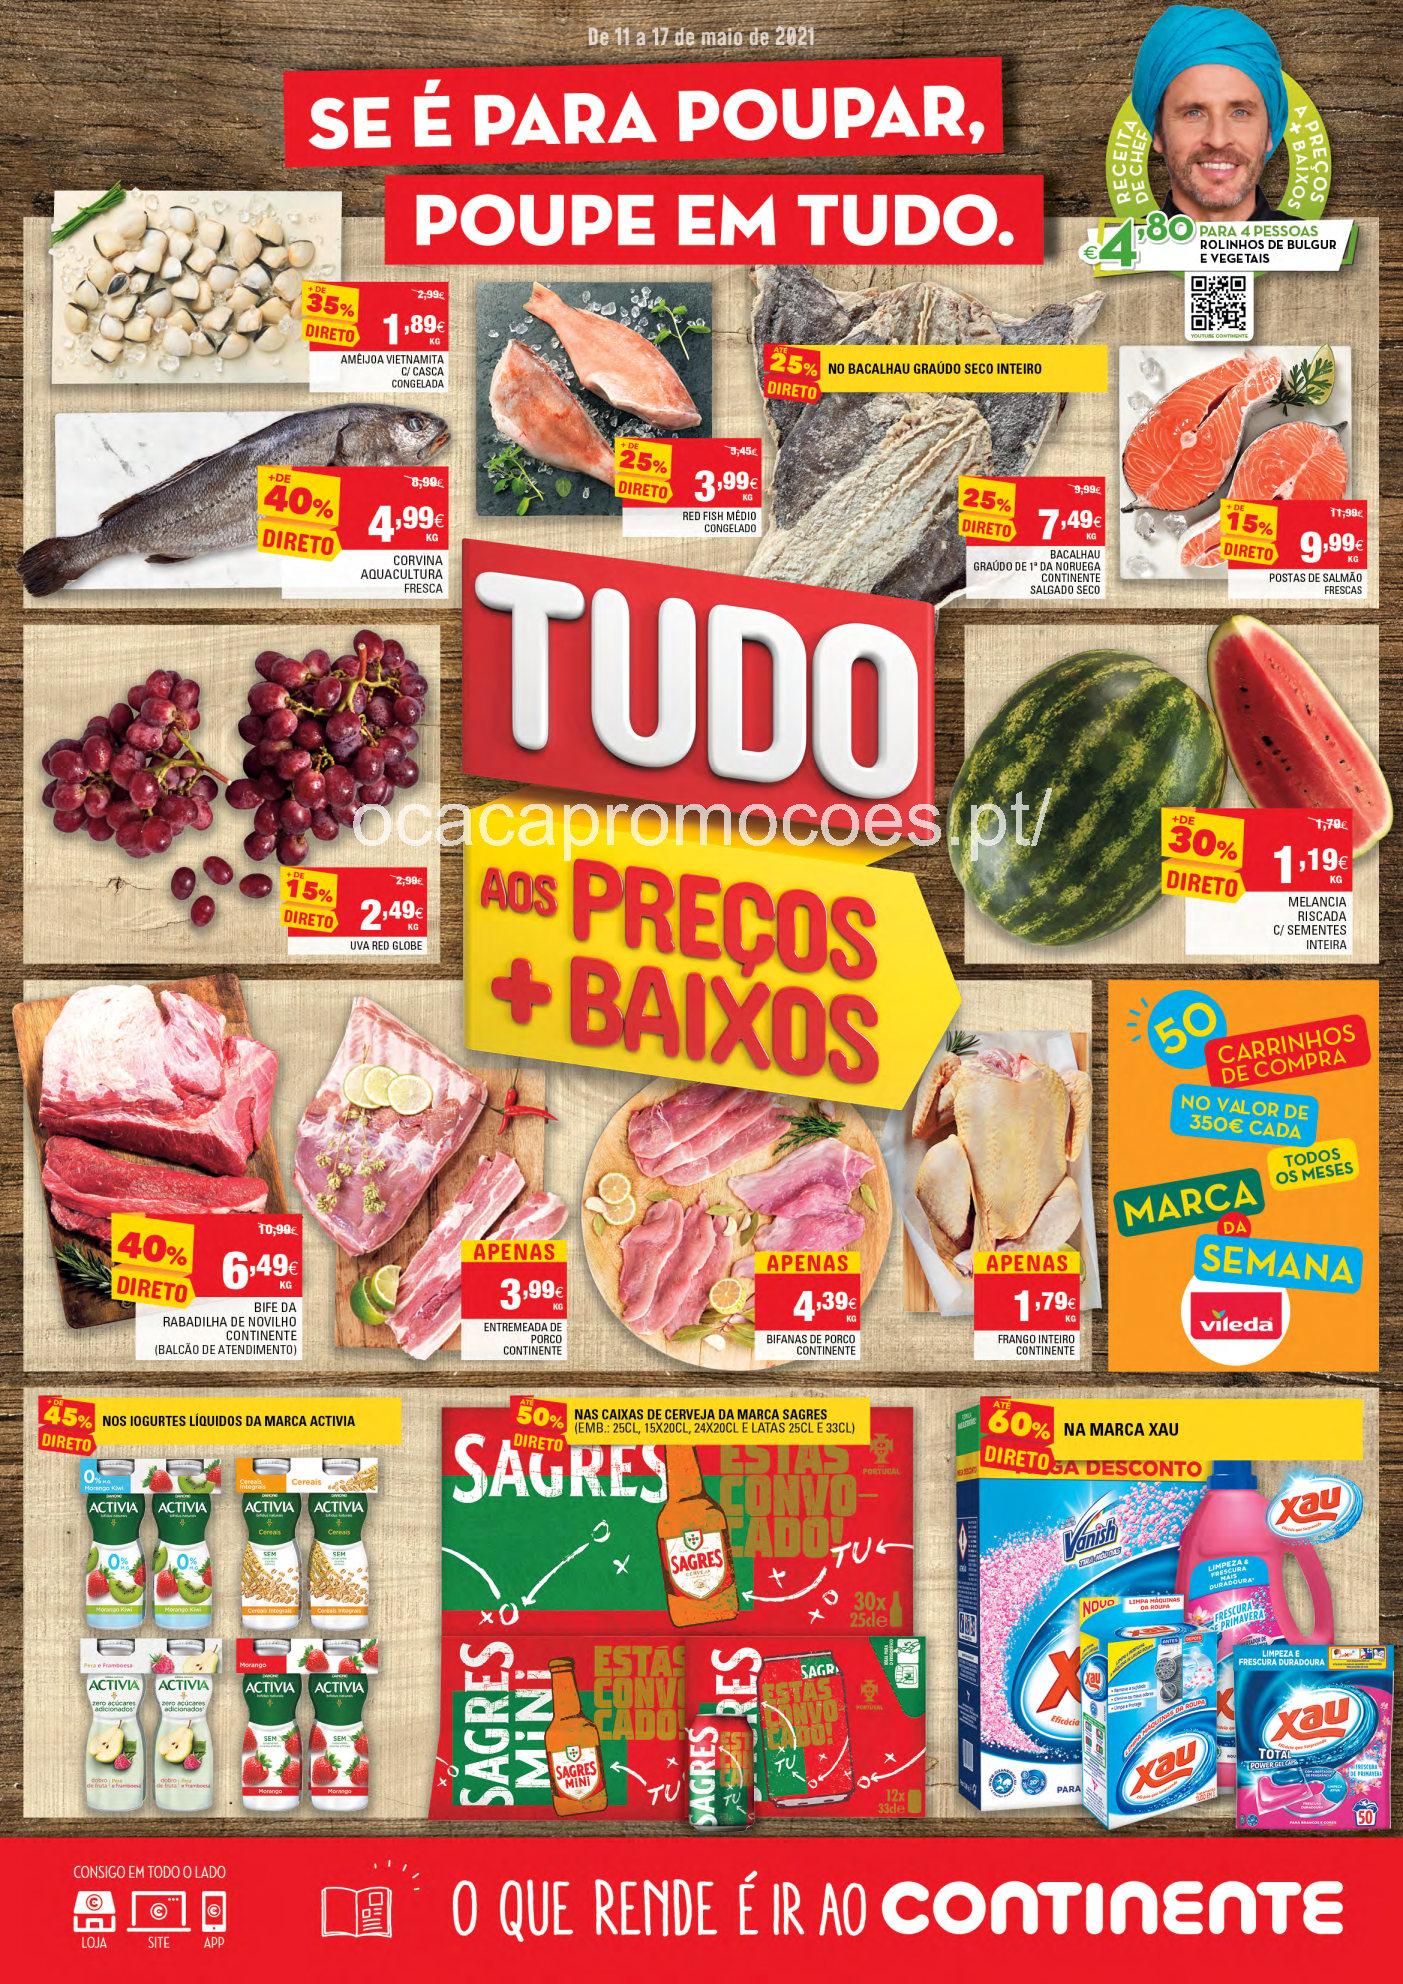 folheto continente promocoes 11 17 maio antevisao Page1